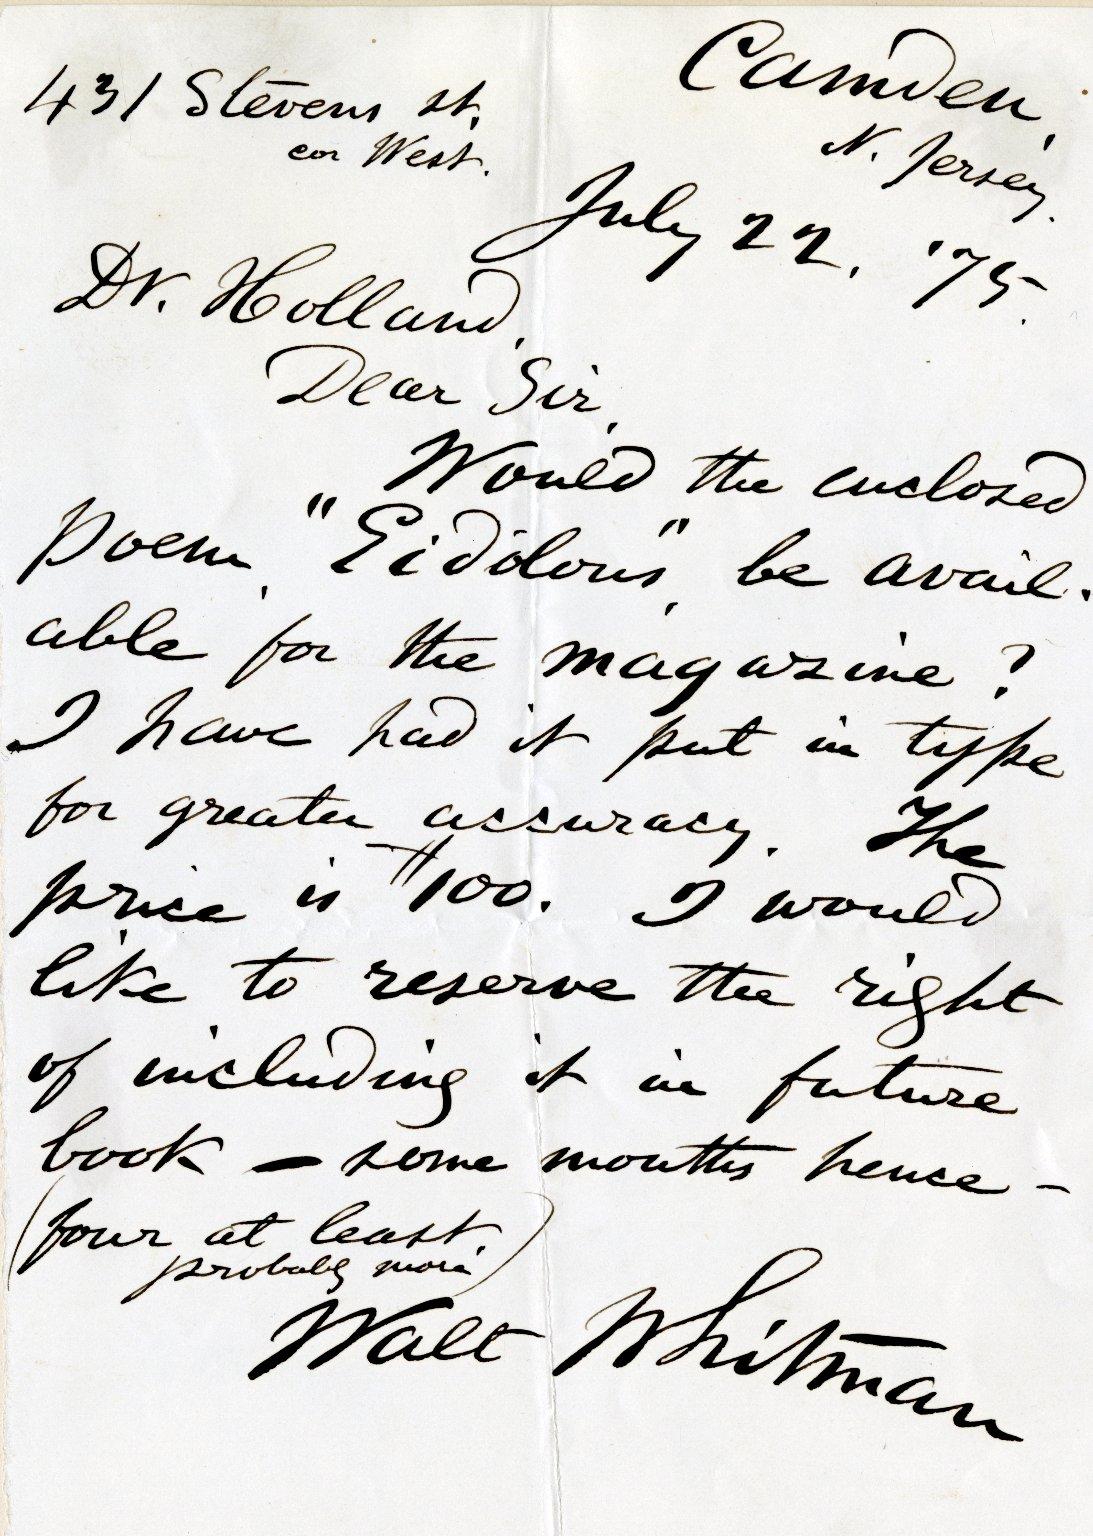 Whitman, Walt. ALS, 1 page, July 22, 1875.